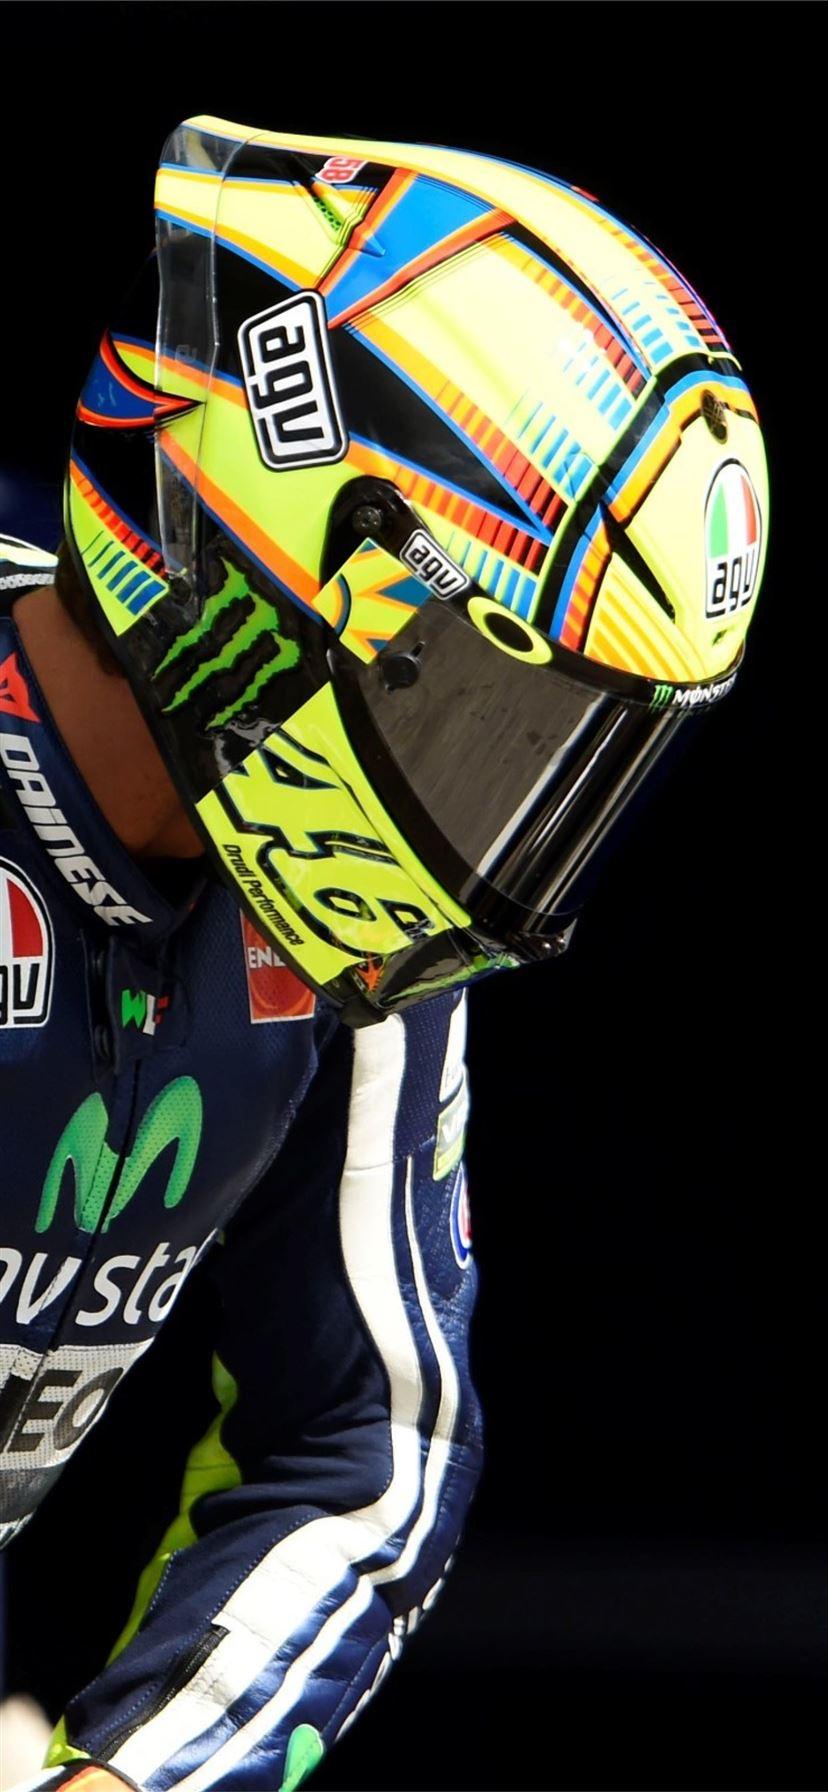 Best Valentino Rossi Iphone 11 Wallpapers Hd Ilikewallpaper